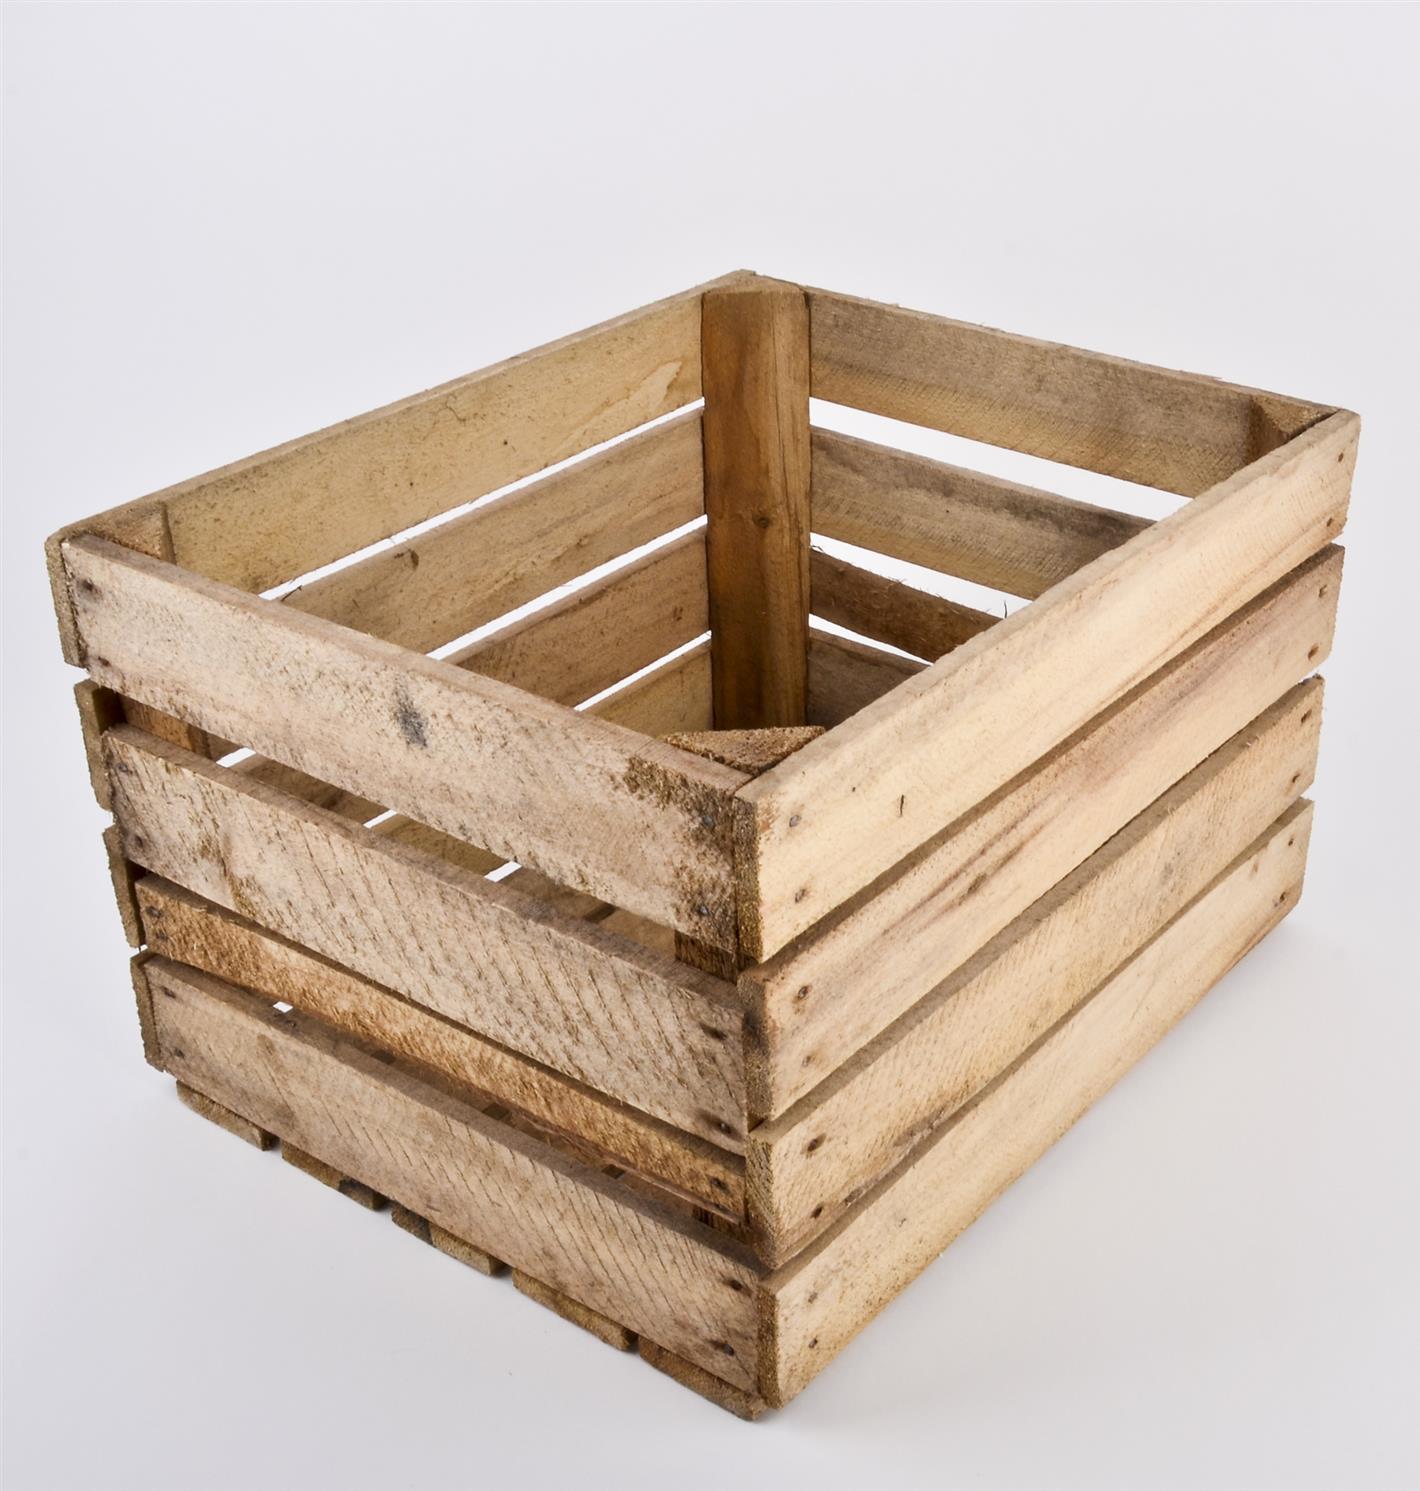 Cajas fruta madera sharemedoc - Cajas de madera para frutas ...